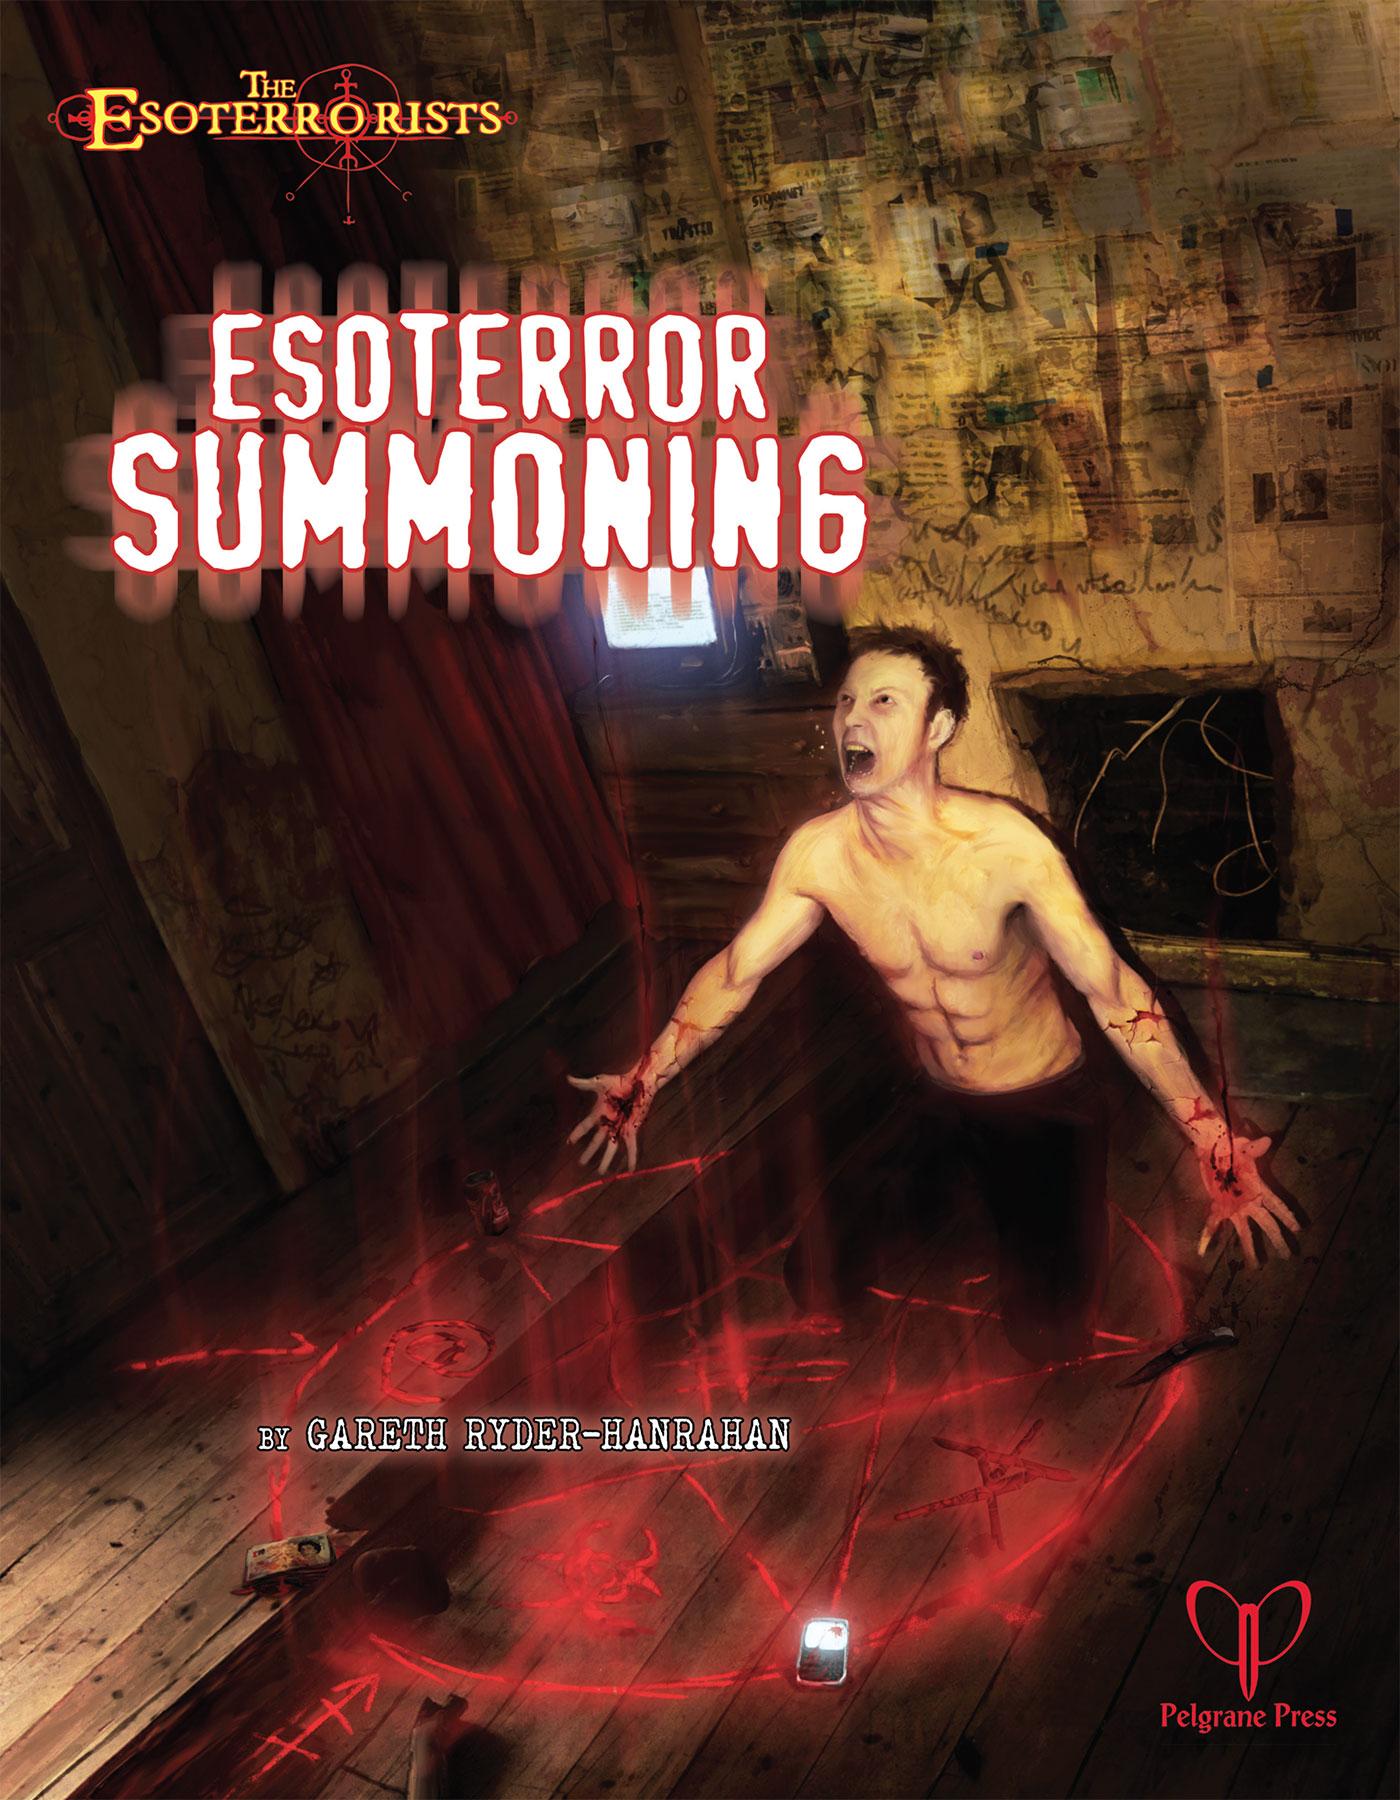 The_Esoterror_Summoning_Guide